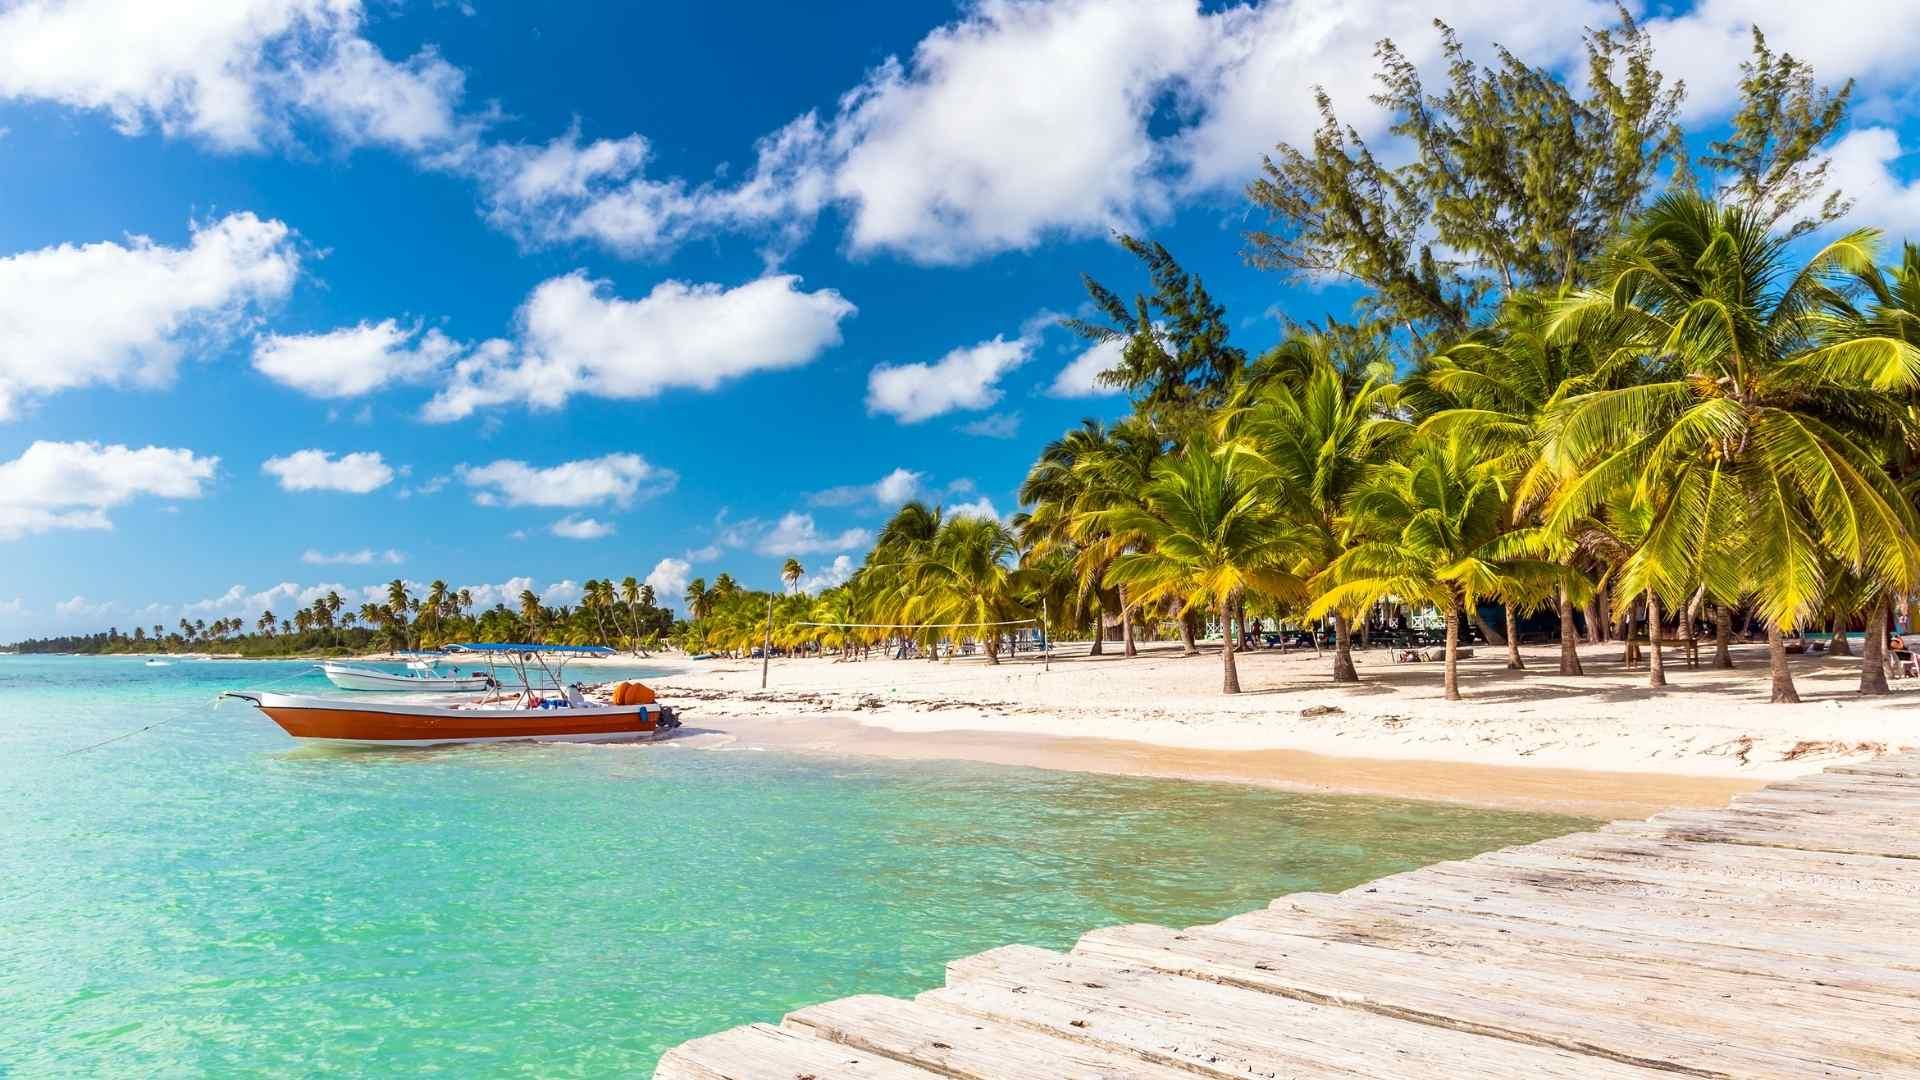 Dominican Republic cruise port